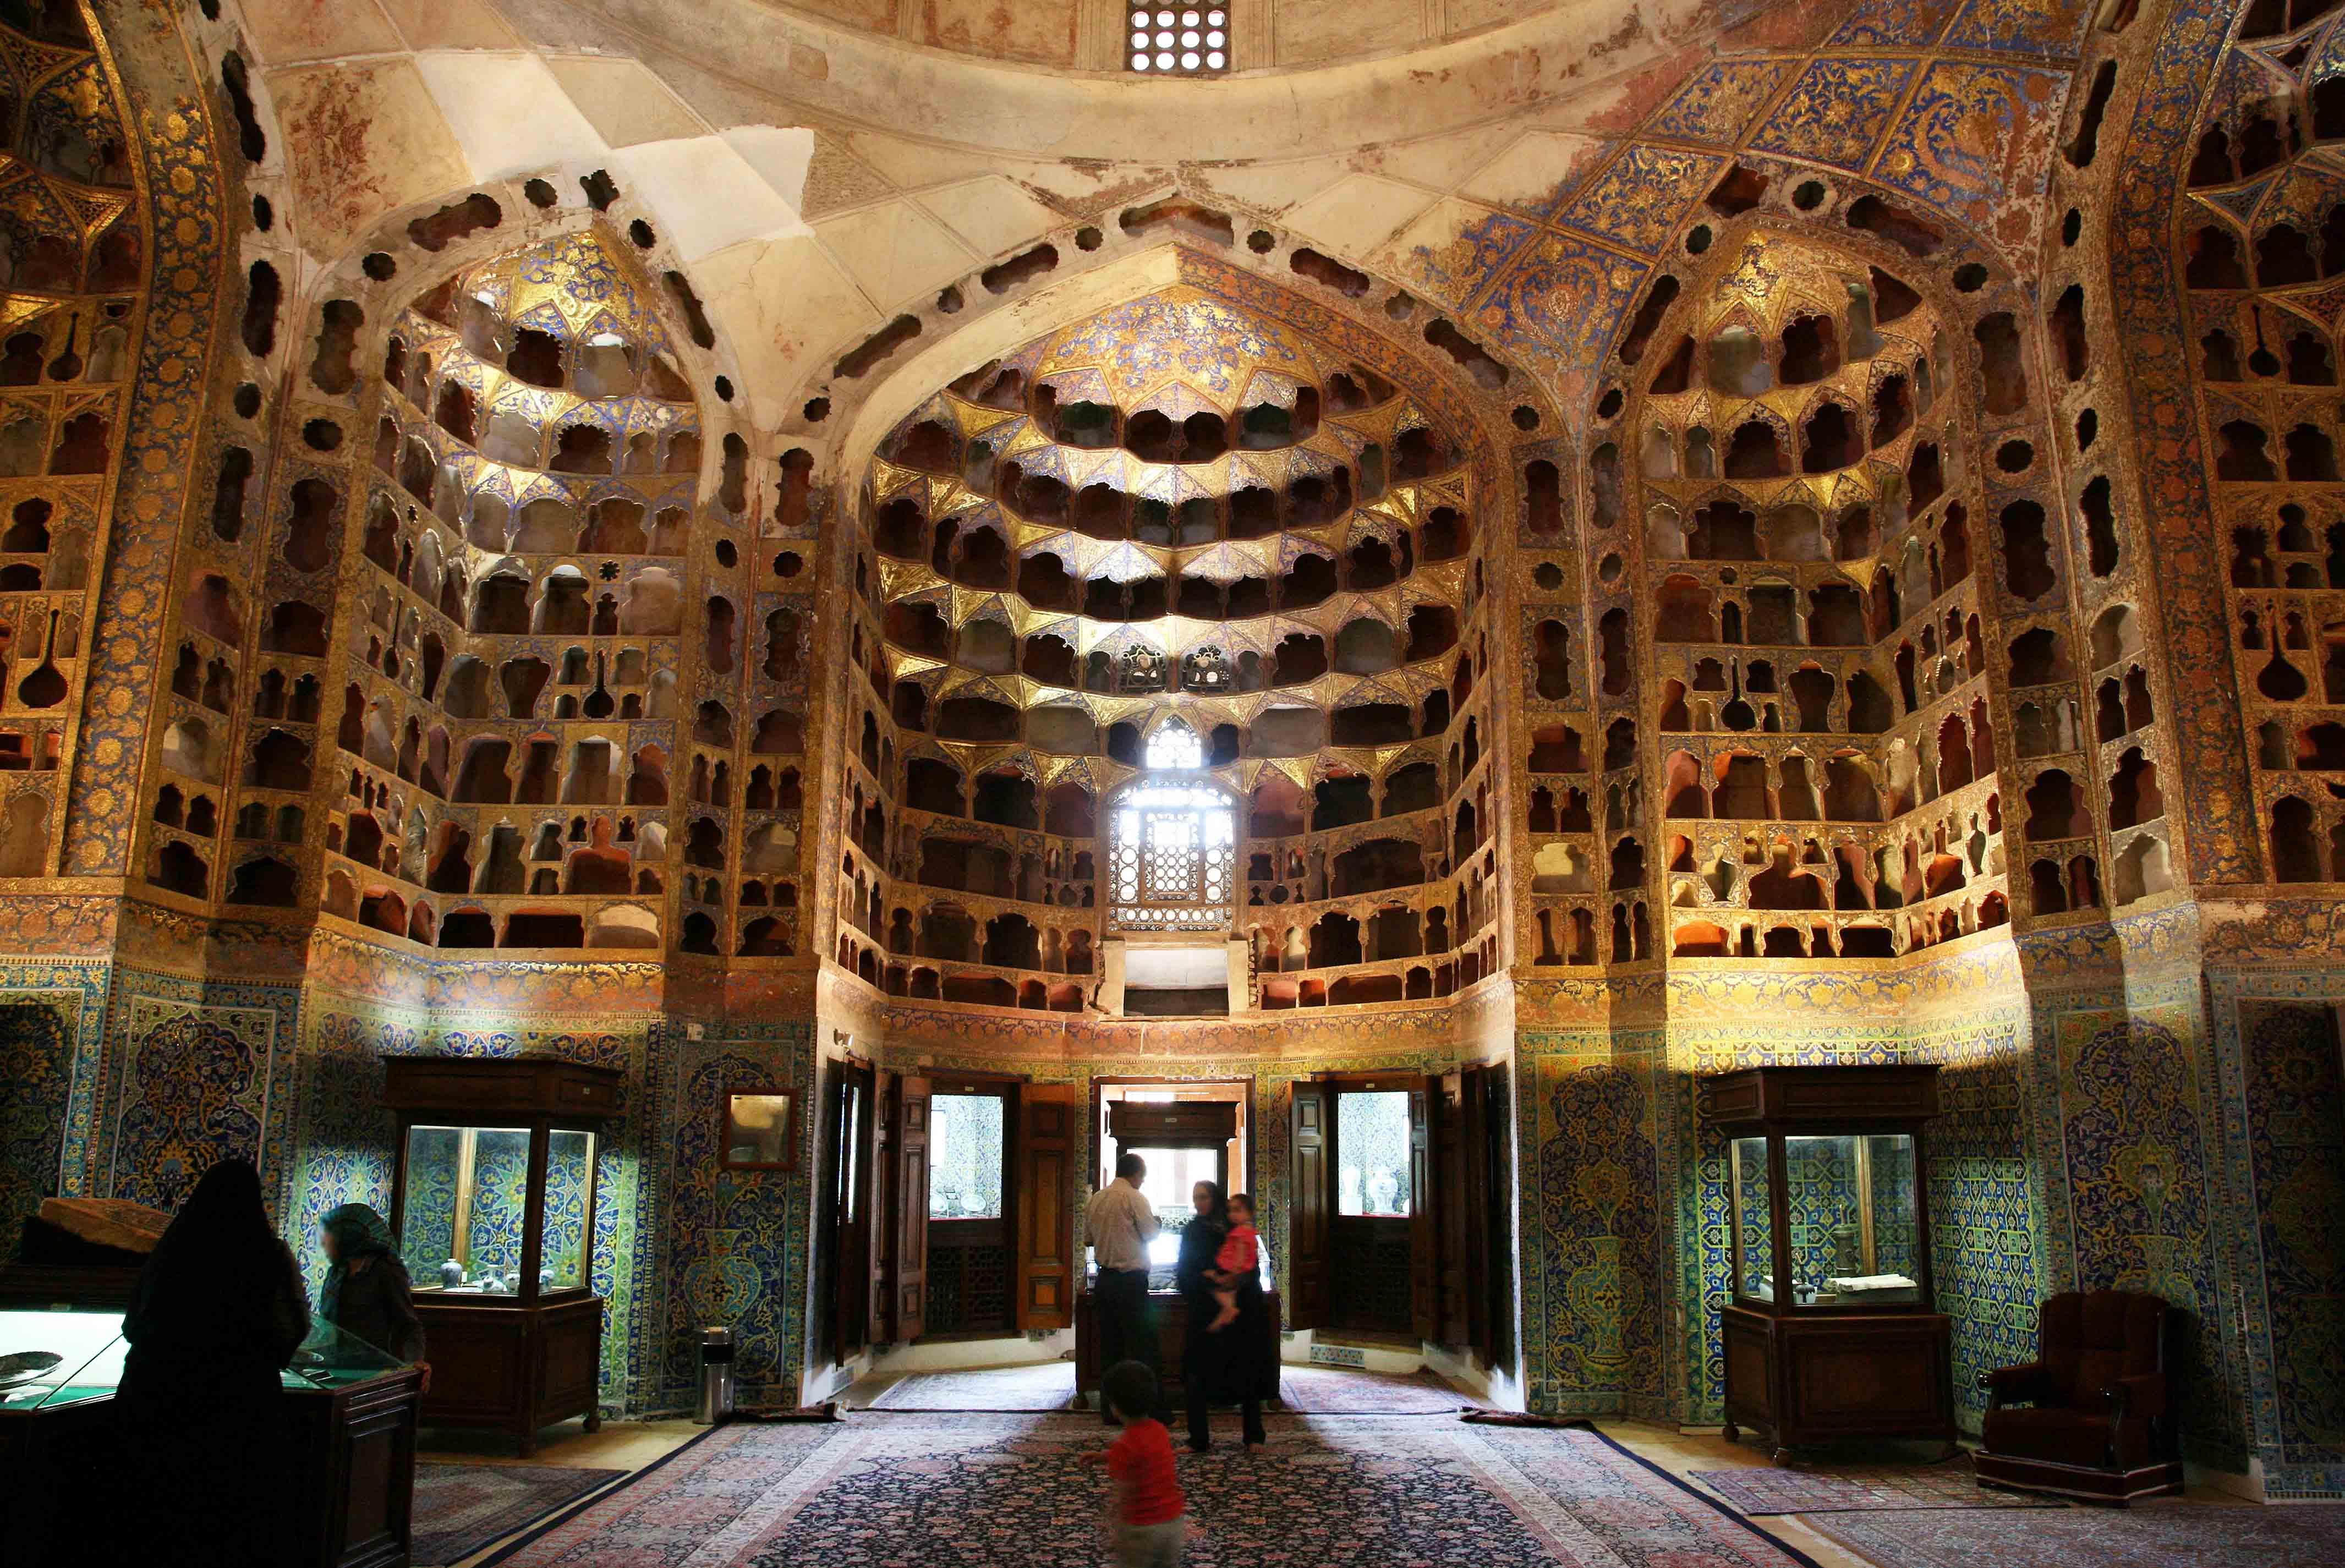 Chini Khaneh, Ardabil, Iran (photo: © UNESCO/Iran Images/Mohammad Tajik, Sheikh Safi al-din Khanegah Shrine Ensemble, in the City of Ardabil, Iran)